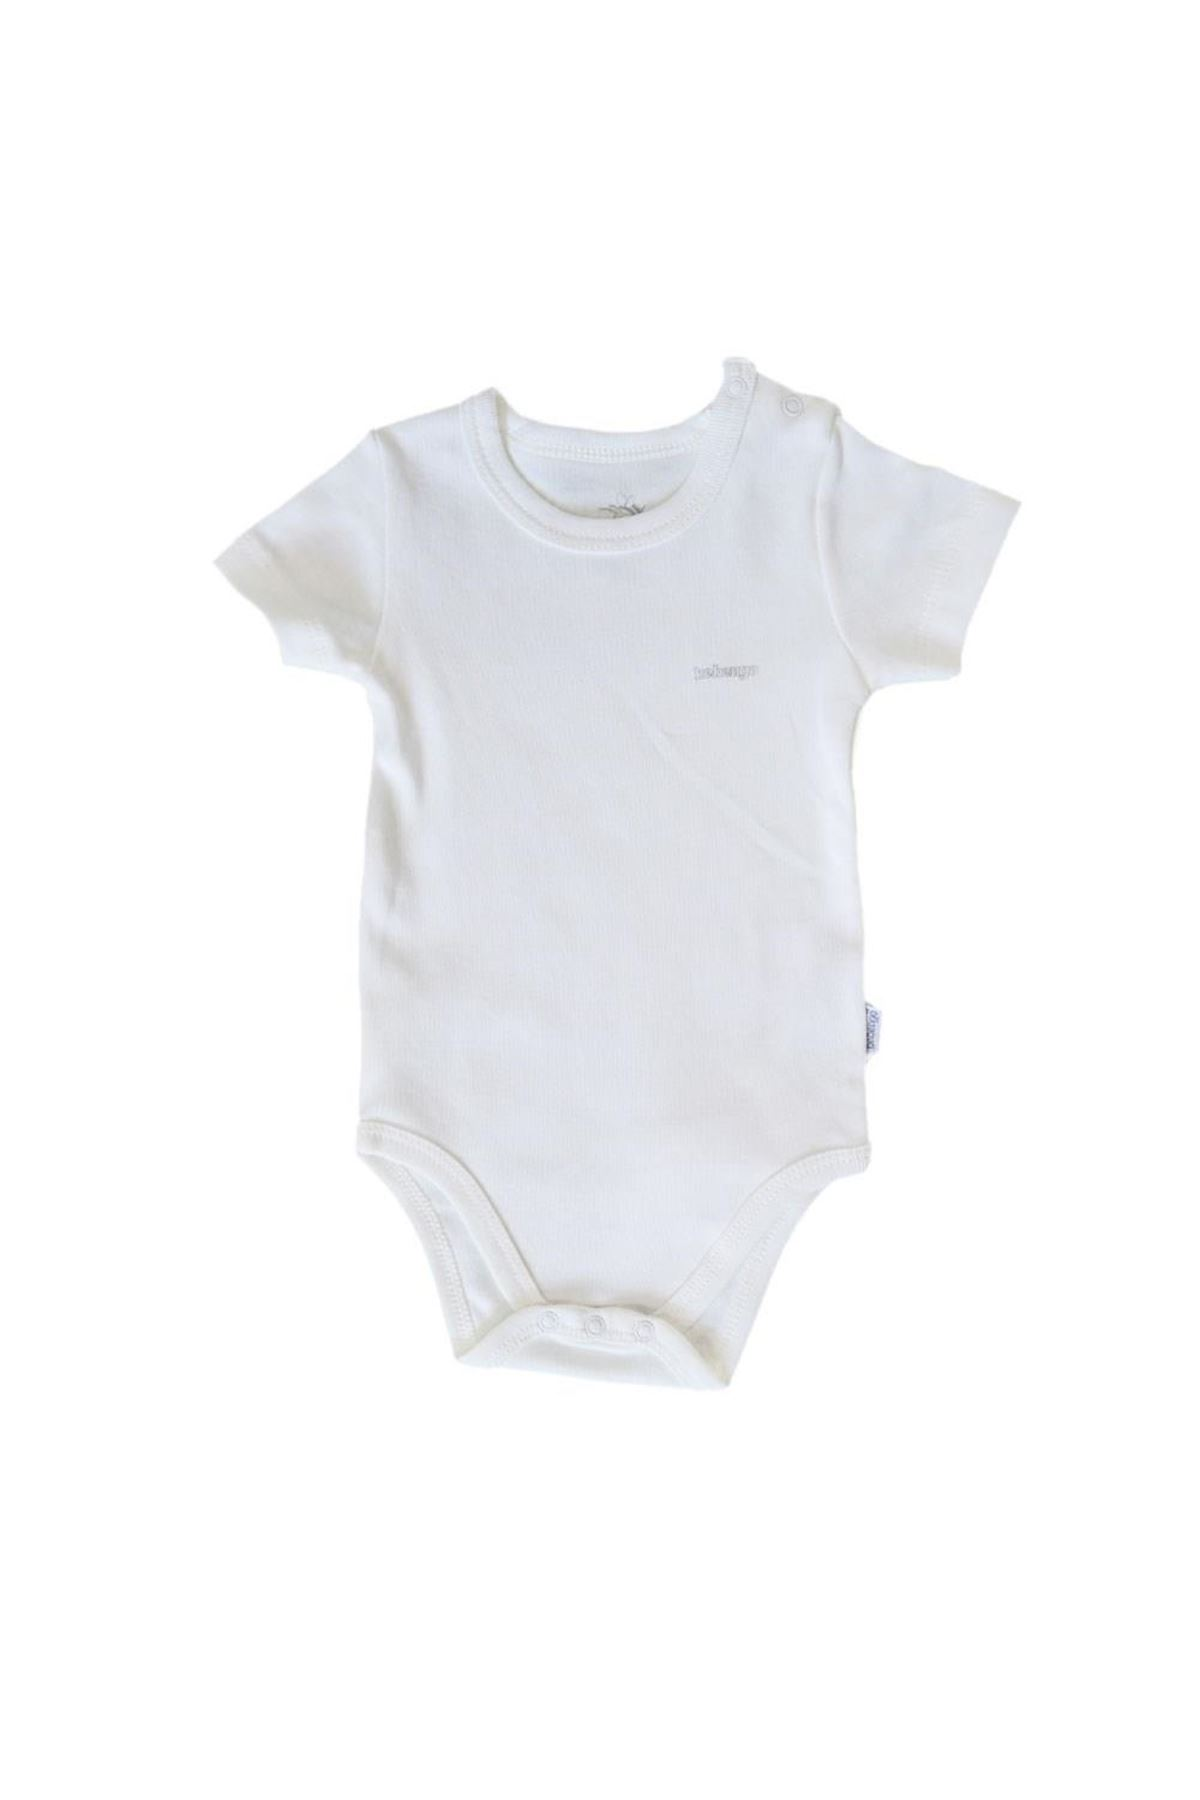 Bebengo Basıc Kısa Kol Bebe Body 4021 Ekru